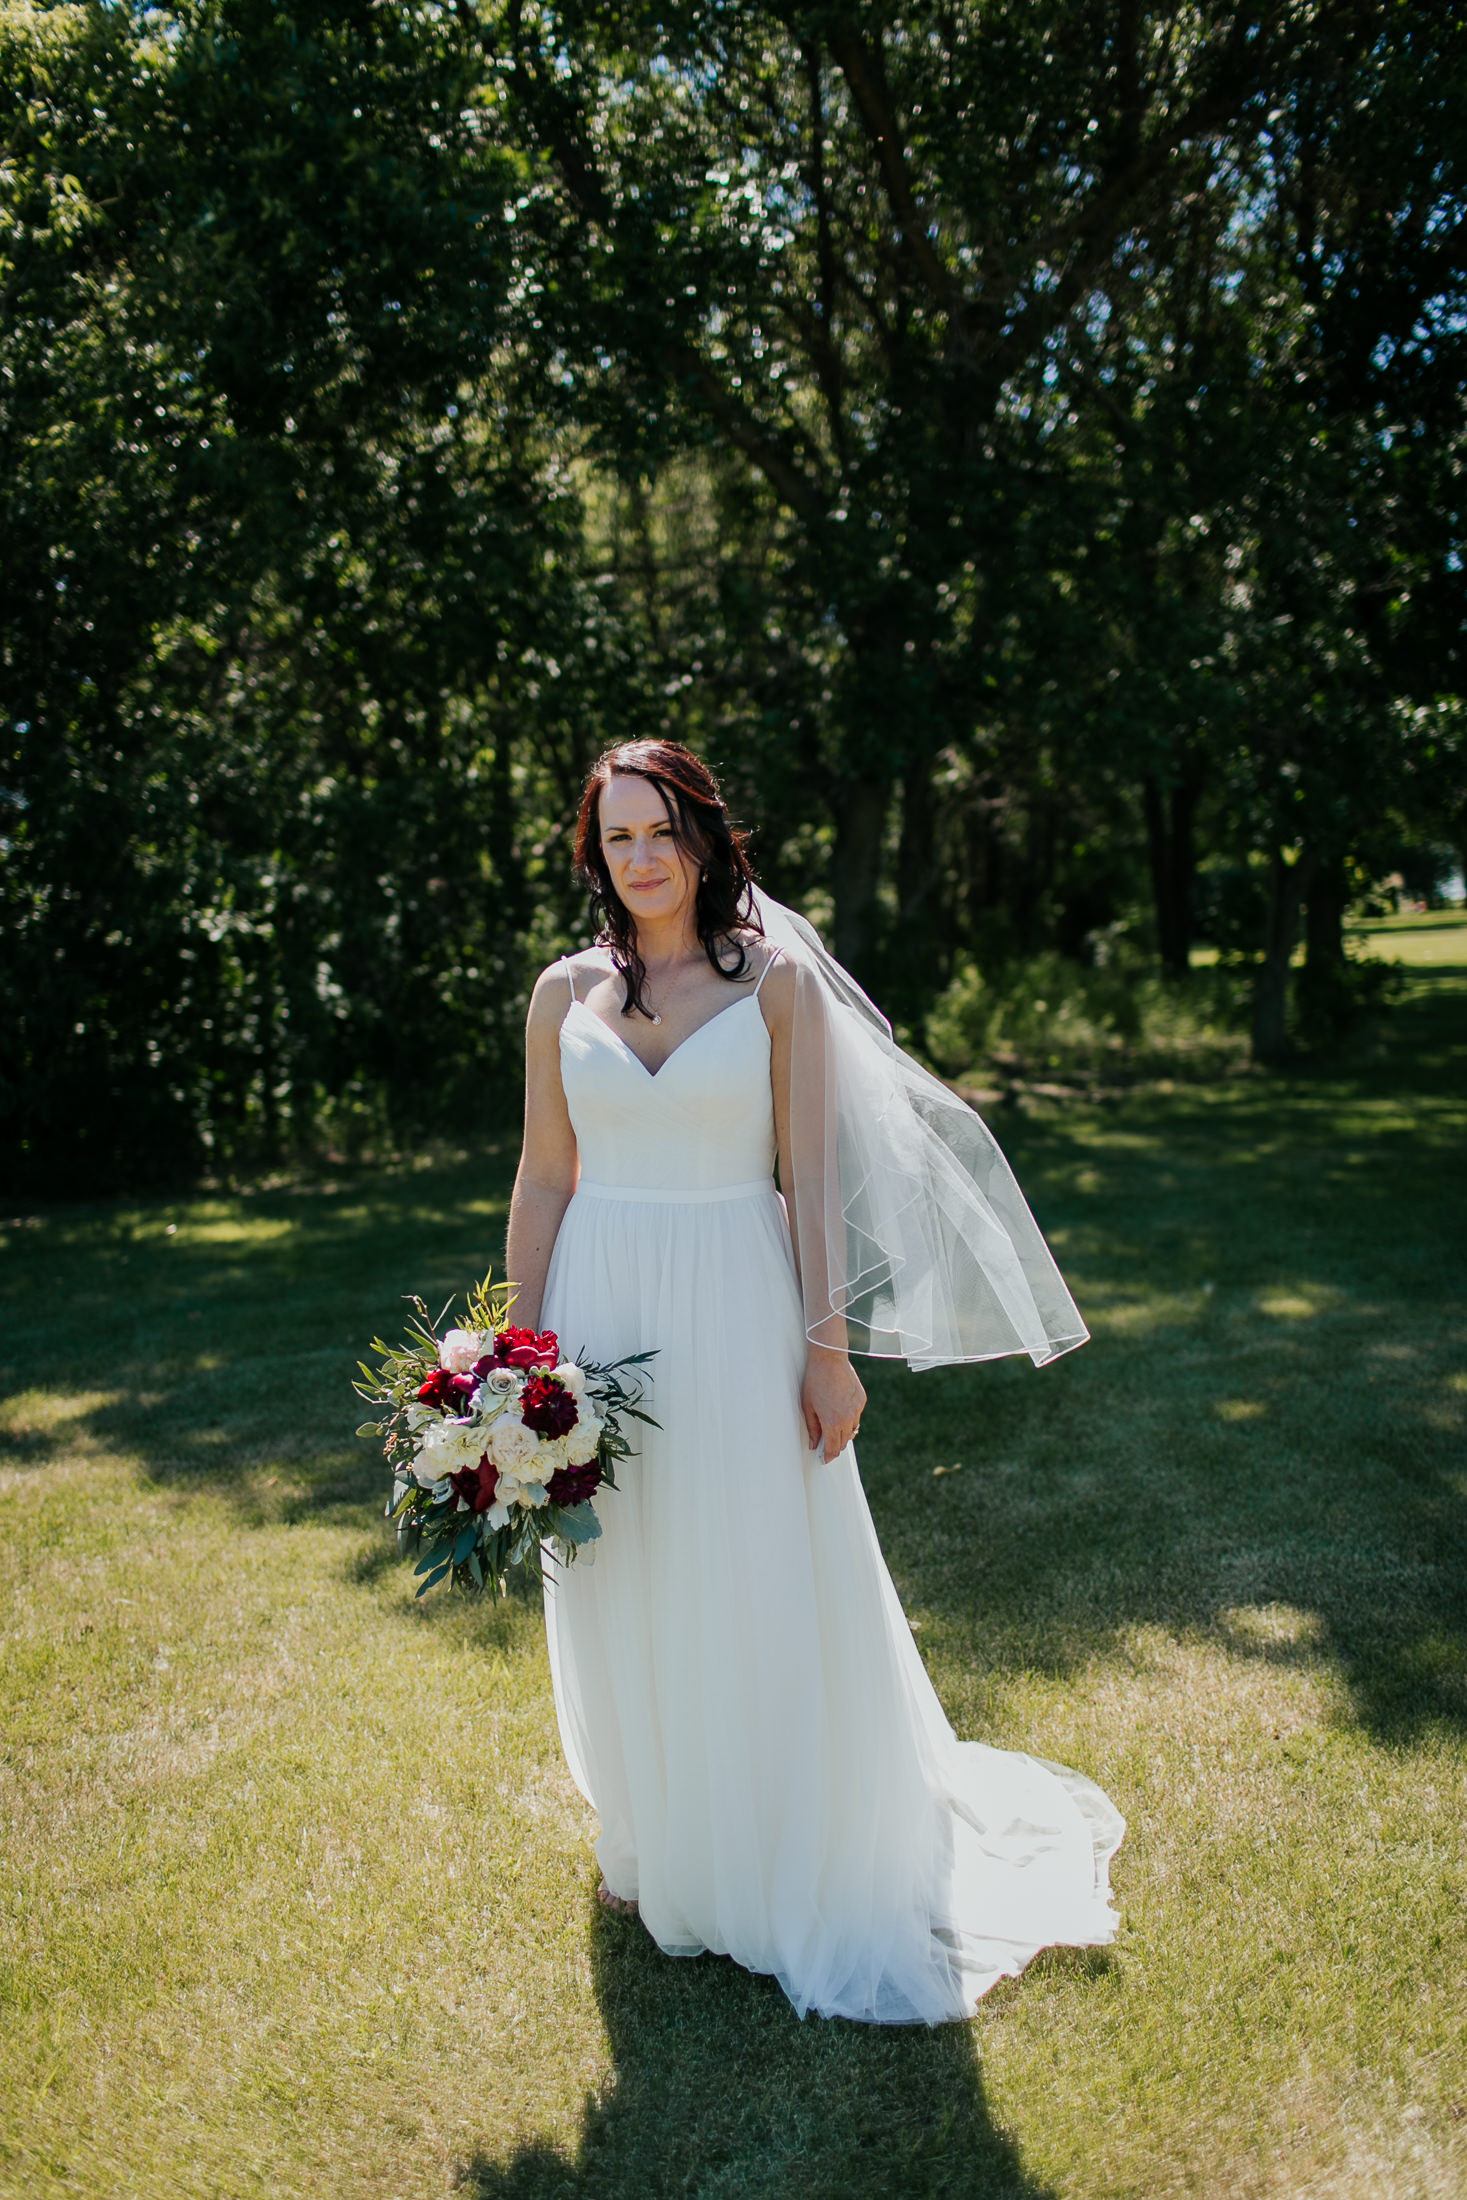 kevin&lori_wedding_015.jpg